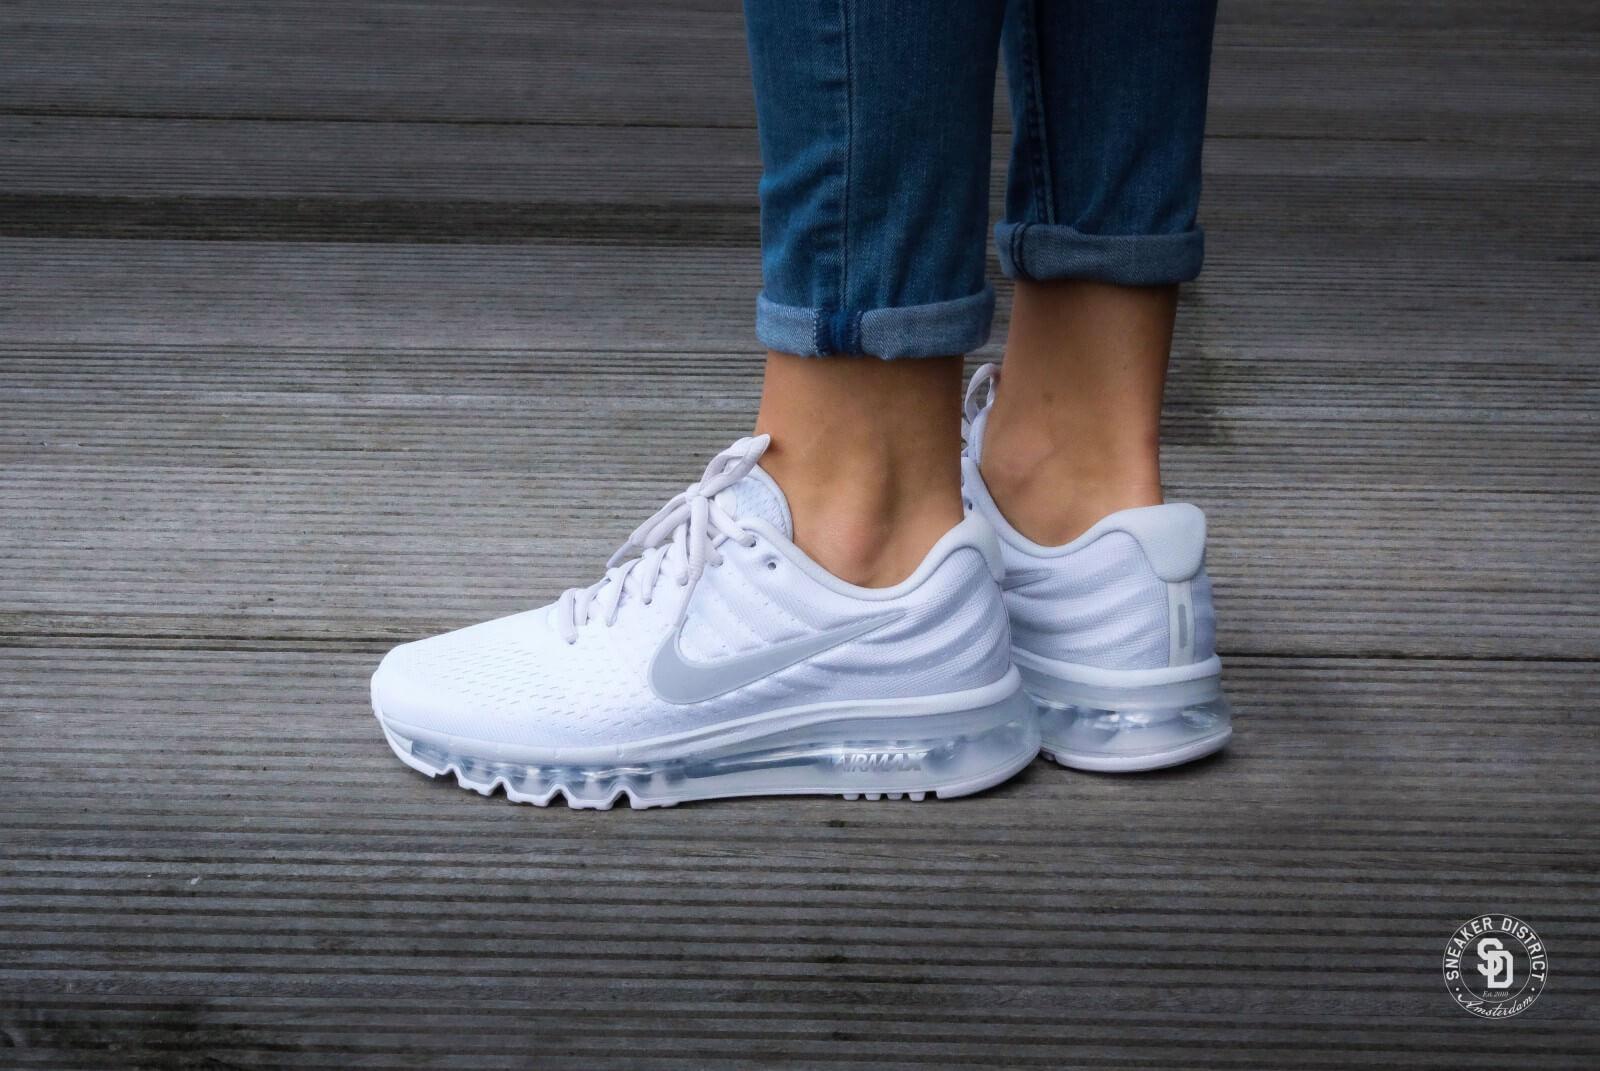 Nike Wmns Air Max 2017 Pure Platinum Wolf Grey White Off White 849560 009